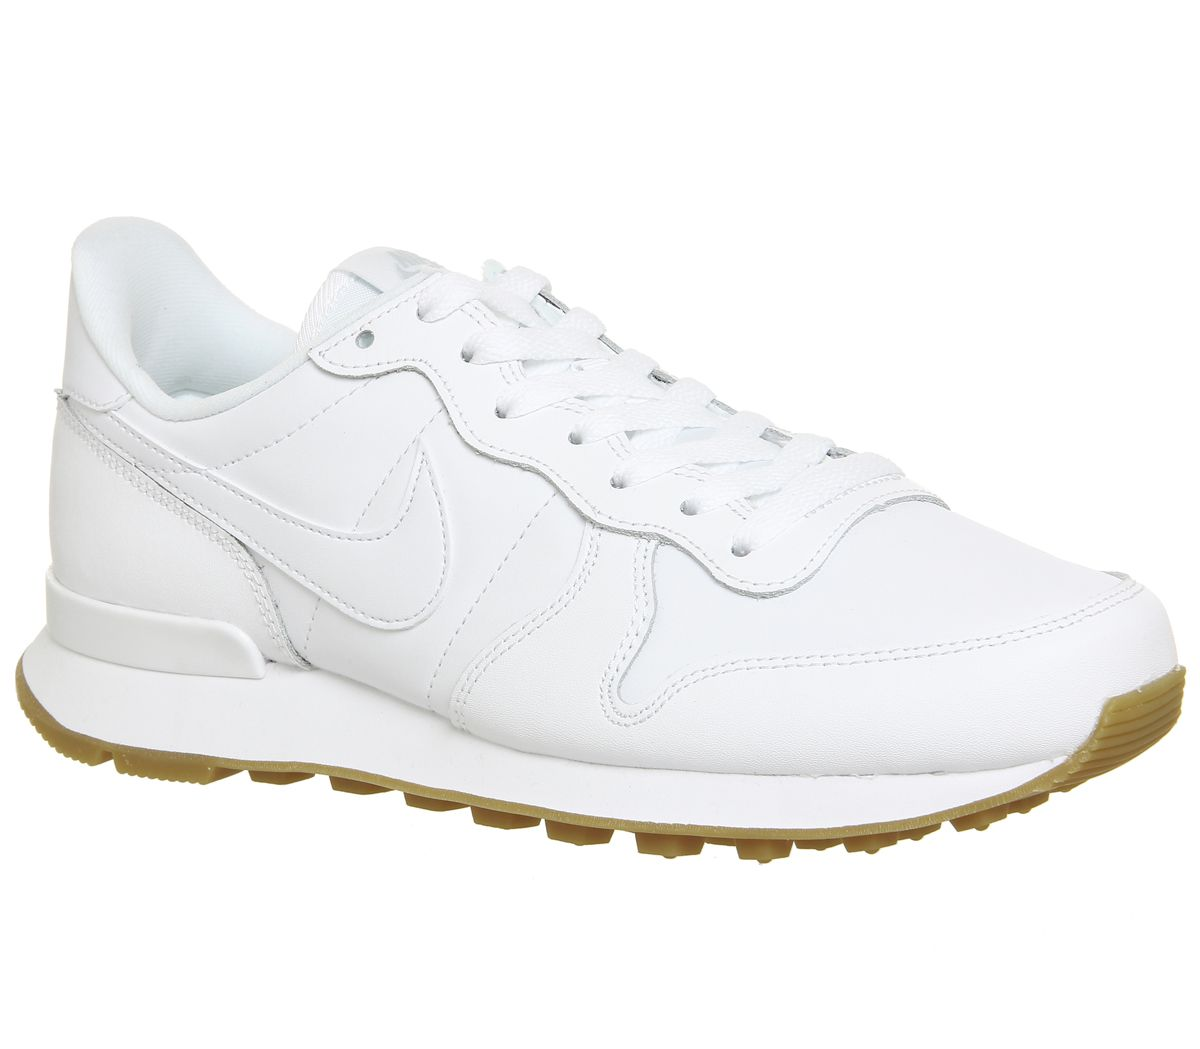 reputable site 44369 b56dd Nike Nike Internationalist Trainers White White Gum - Hers trainers